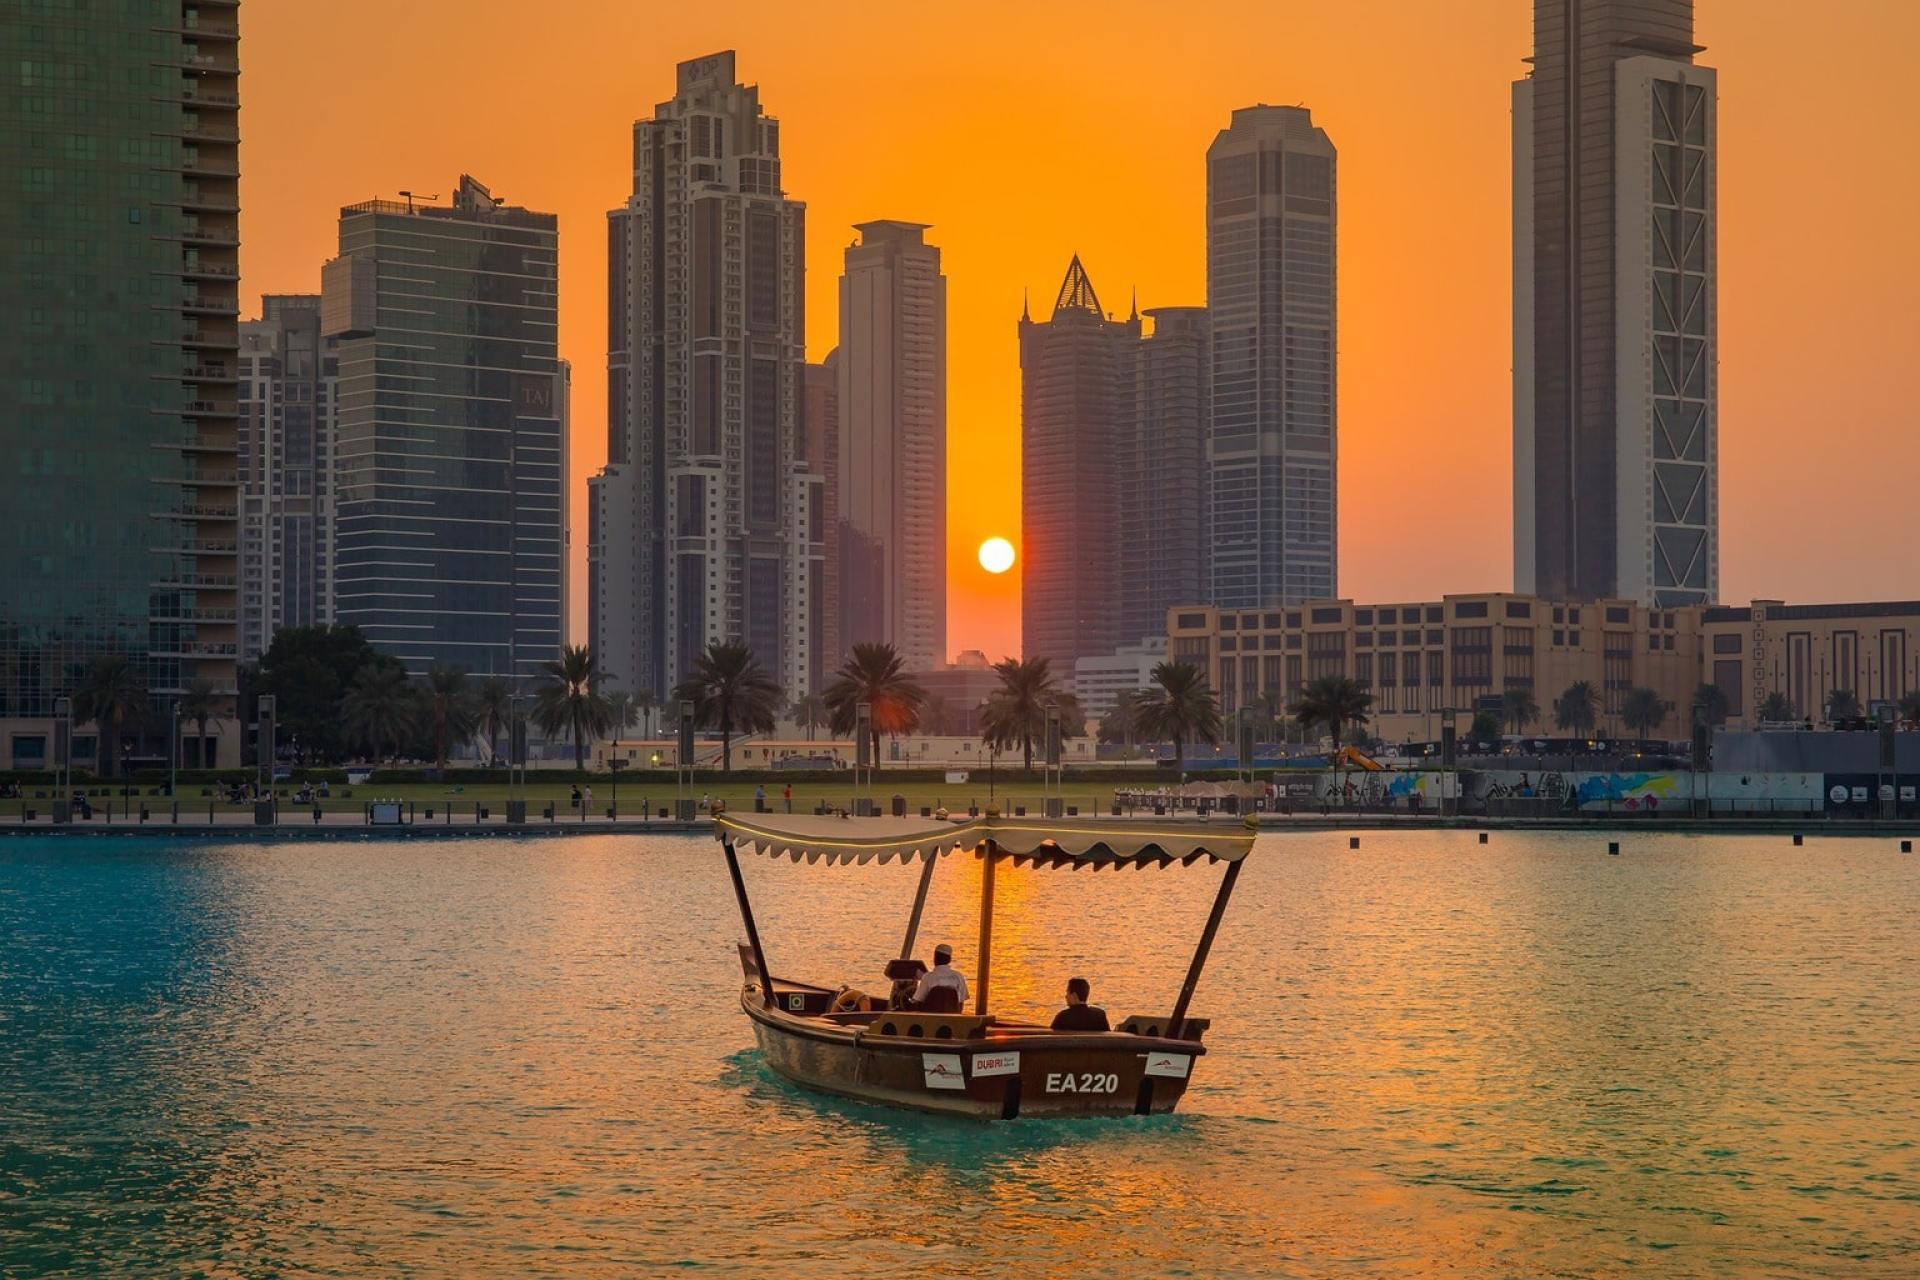 Abra trip down the Dubai Creek